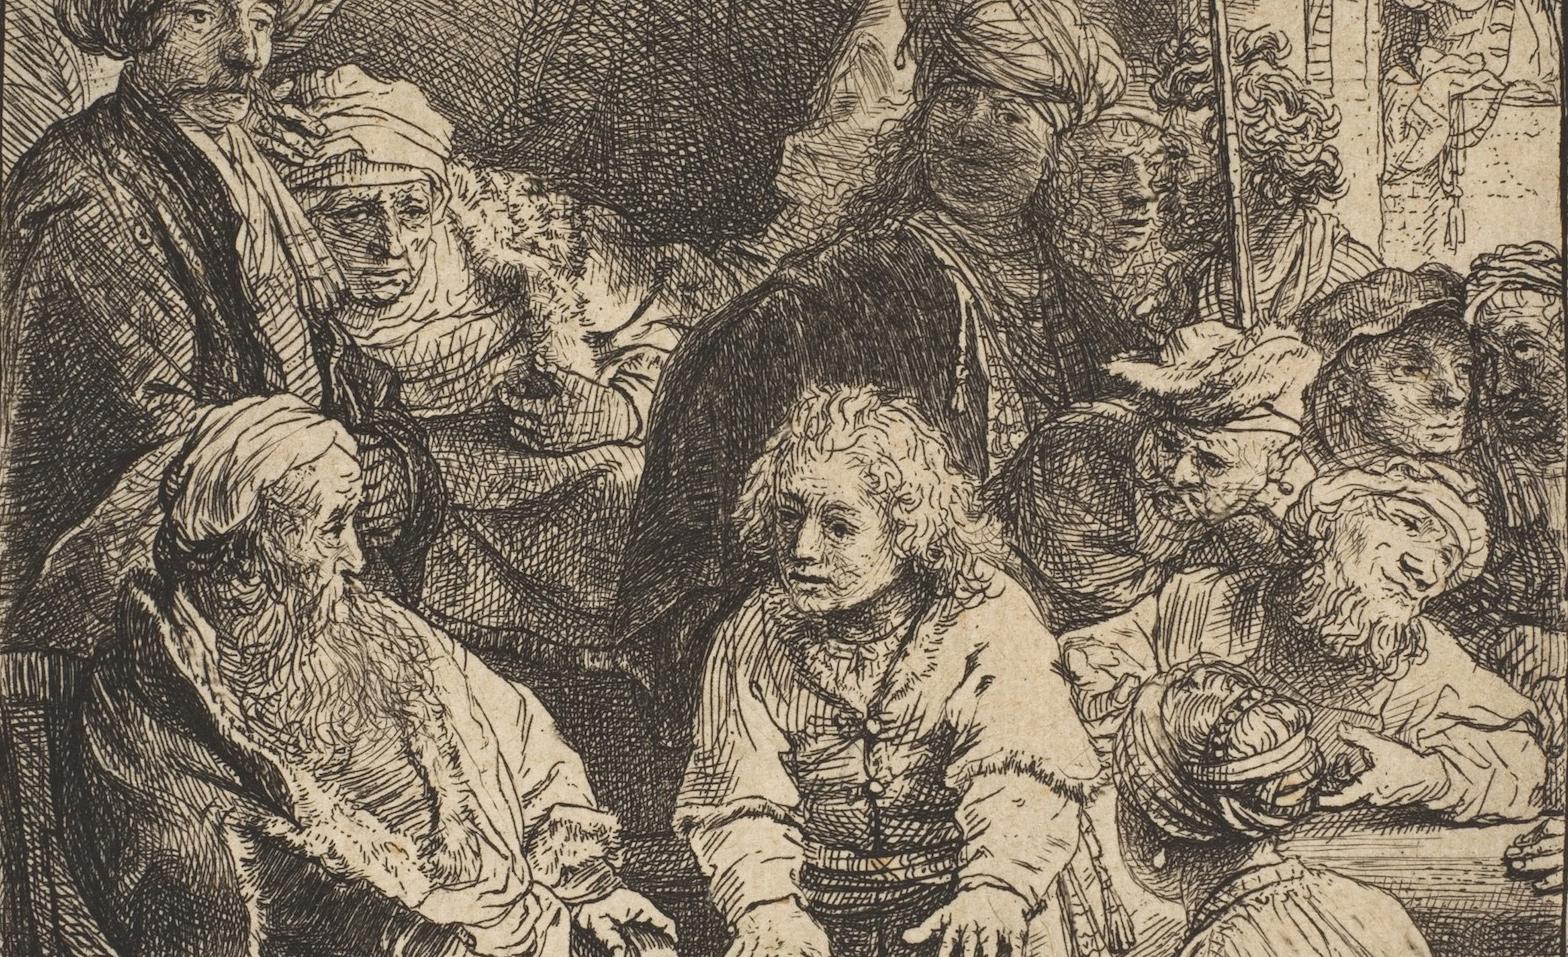 From Rembrandt'sJoseph Telling His Dreams, 1638. Metropolitan Museum of Art.